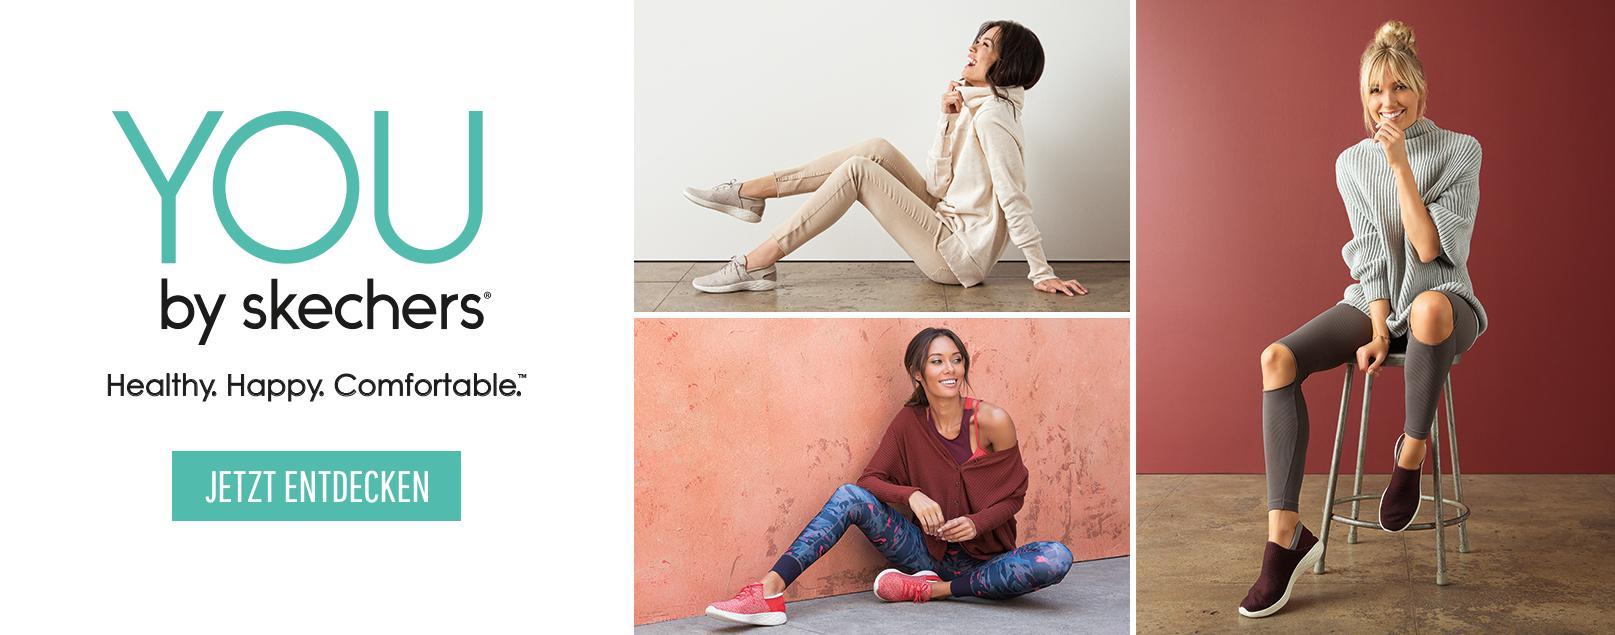 Entdecke YOU by Skechers - Wellness und Lifestyle Schuhe